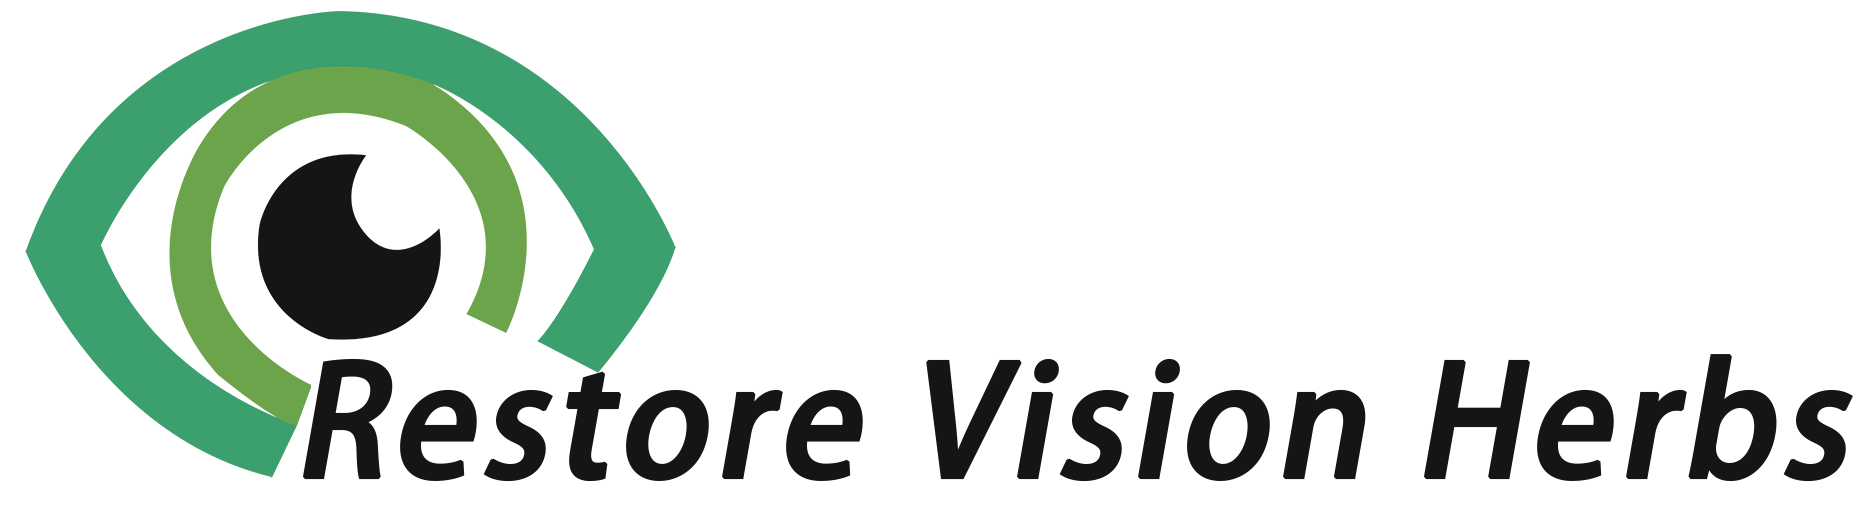 restore vision logo_02